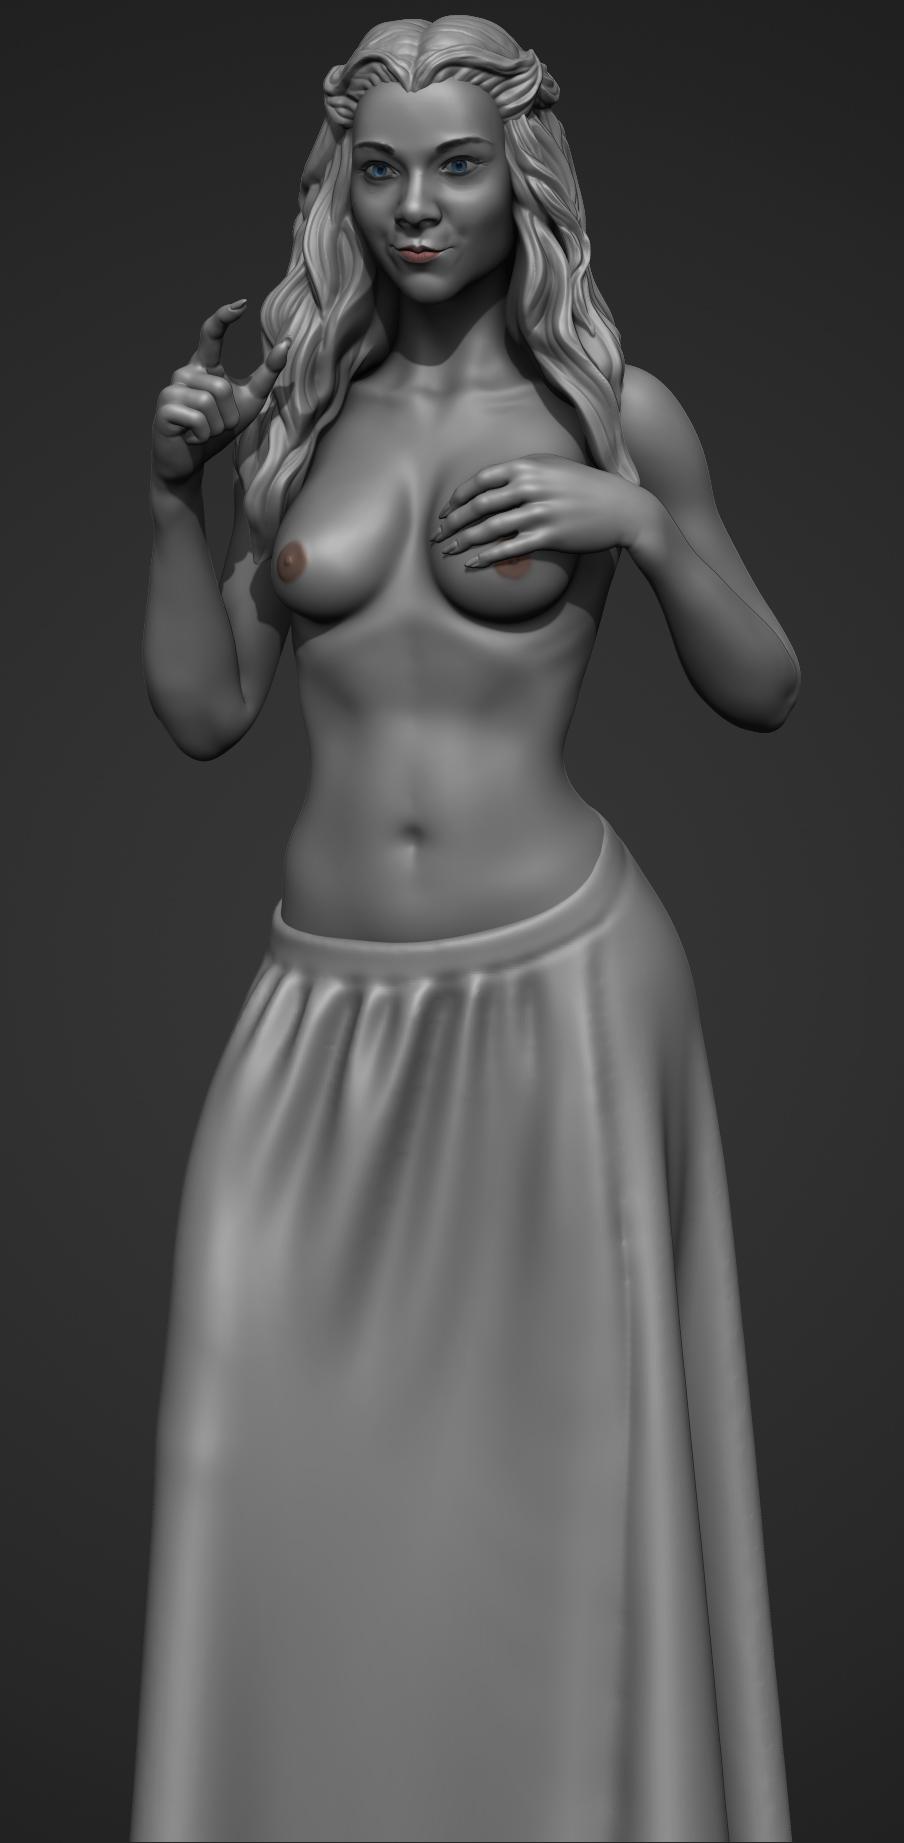 Margaery_03.jpg